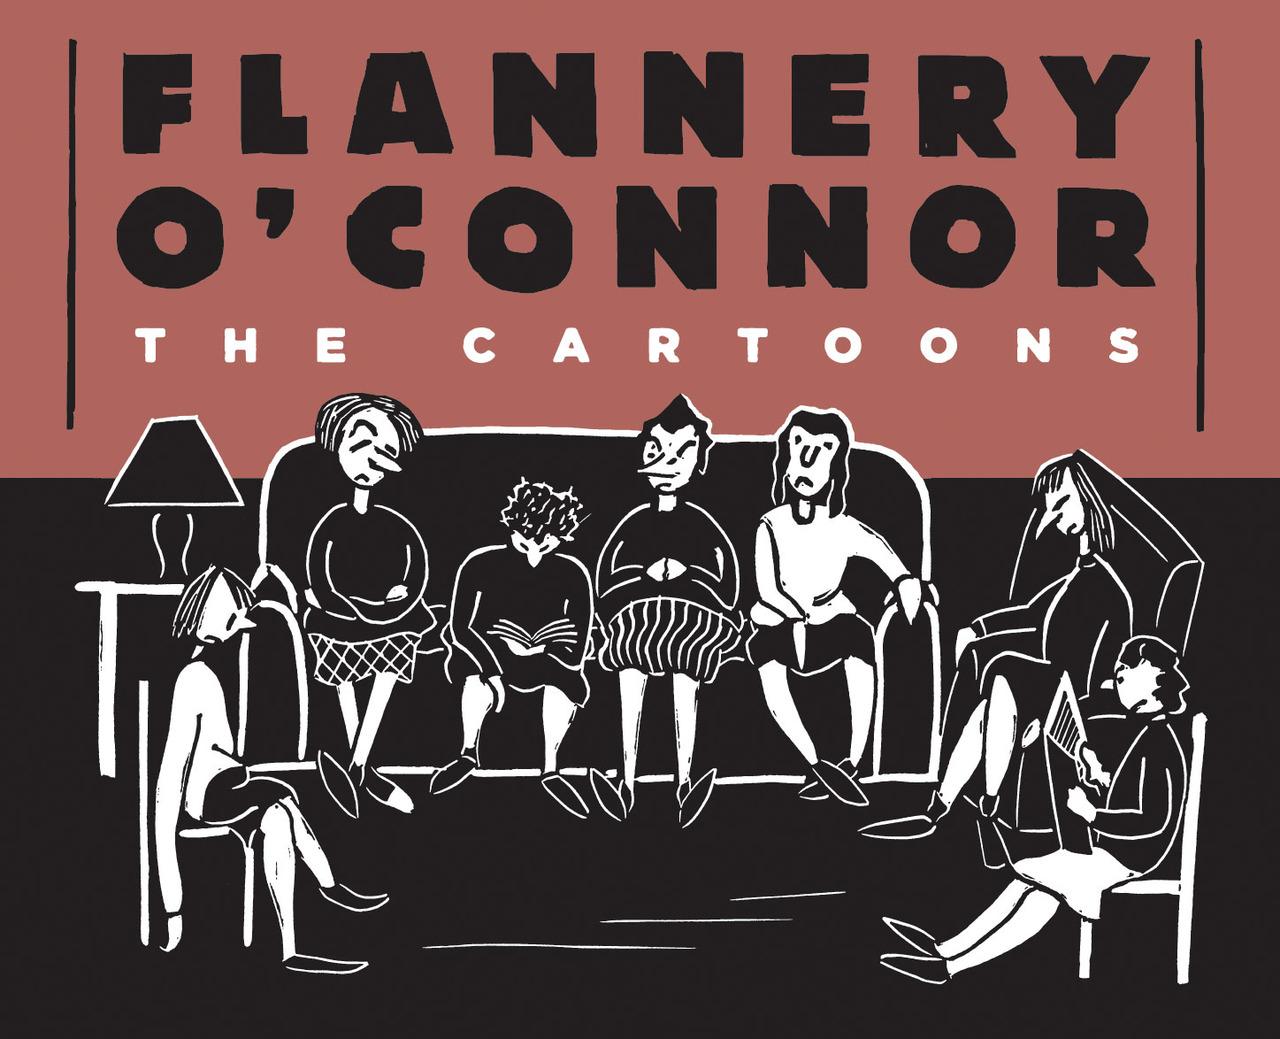 flannery ocartoons.jpg